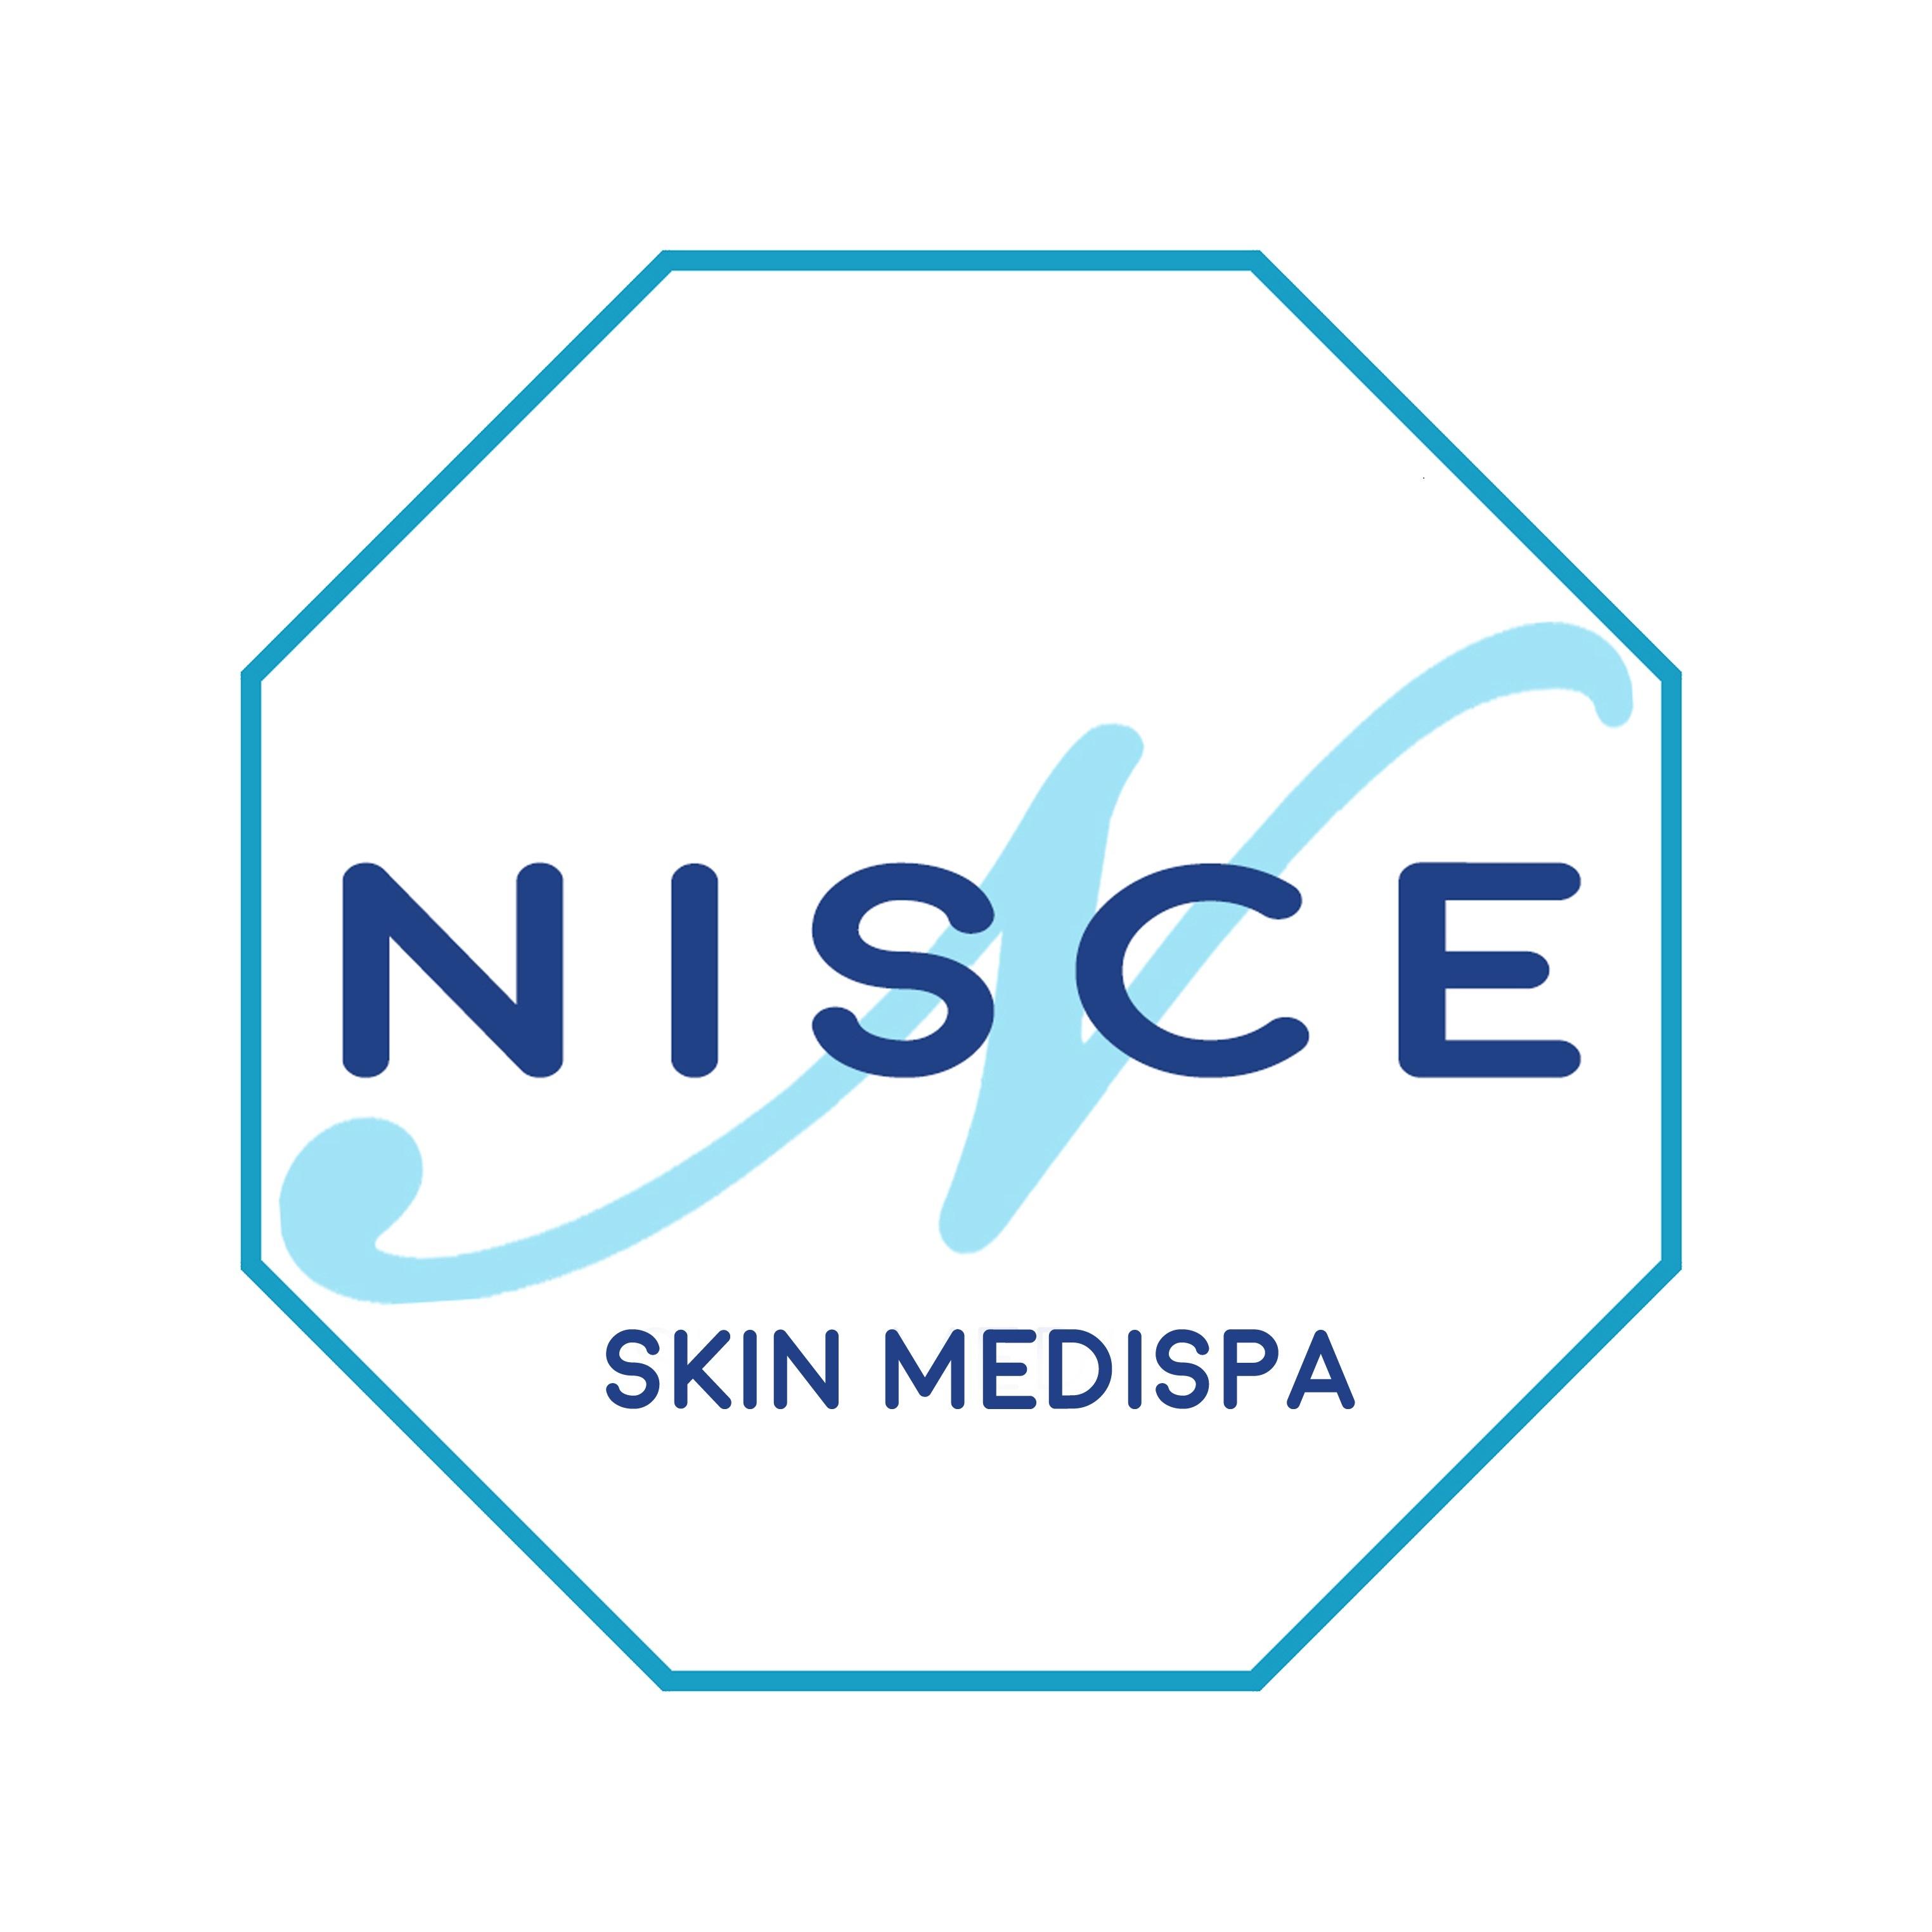 Nisce Skin Medispa logo